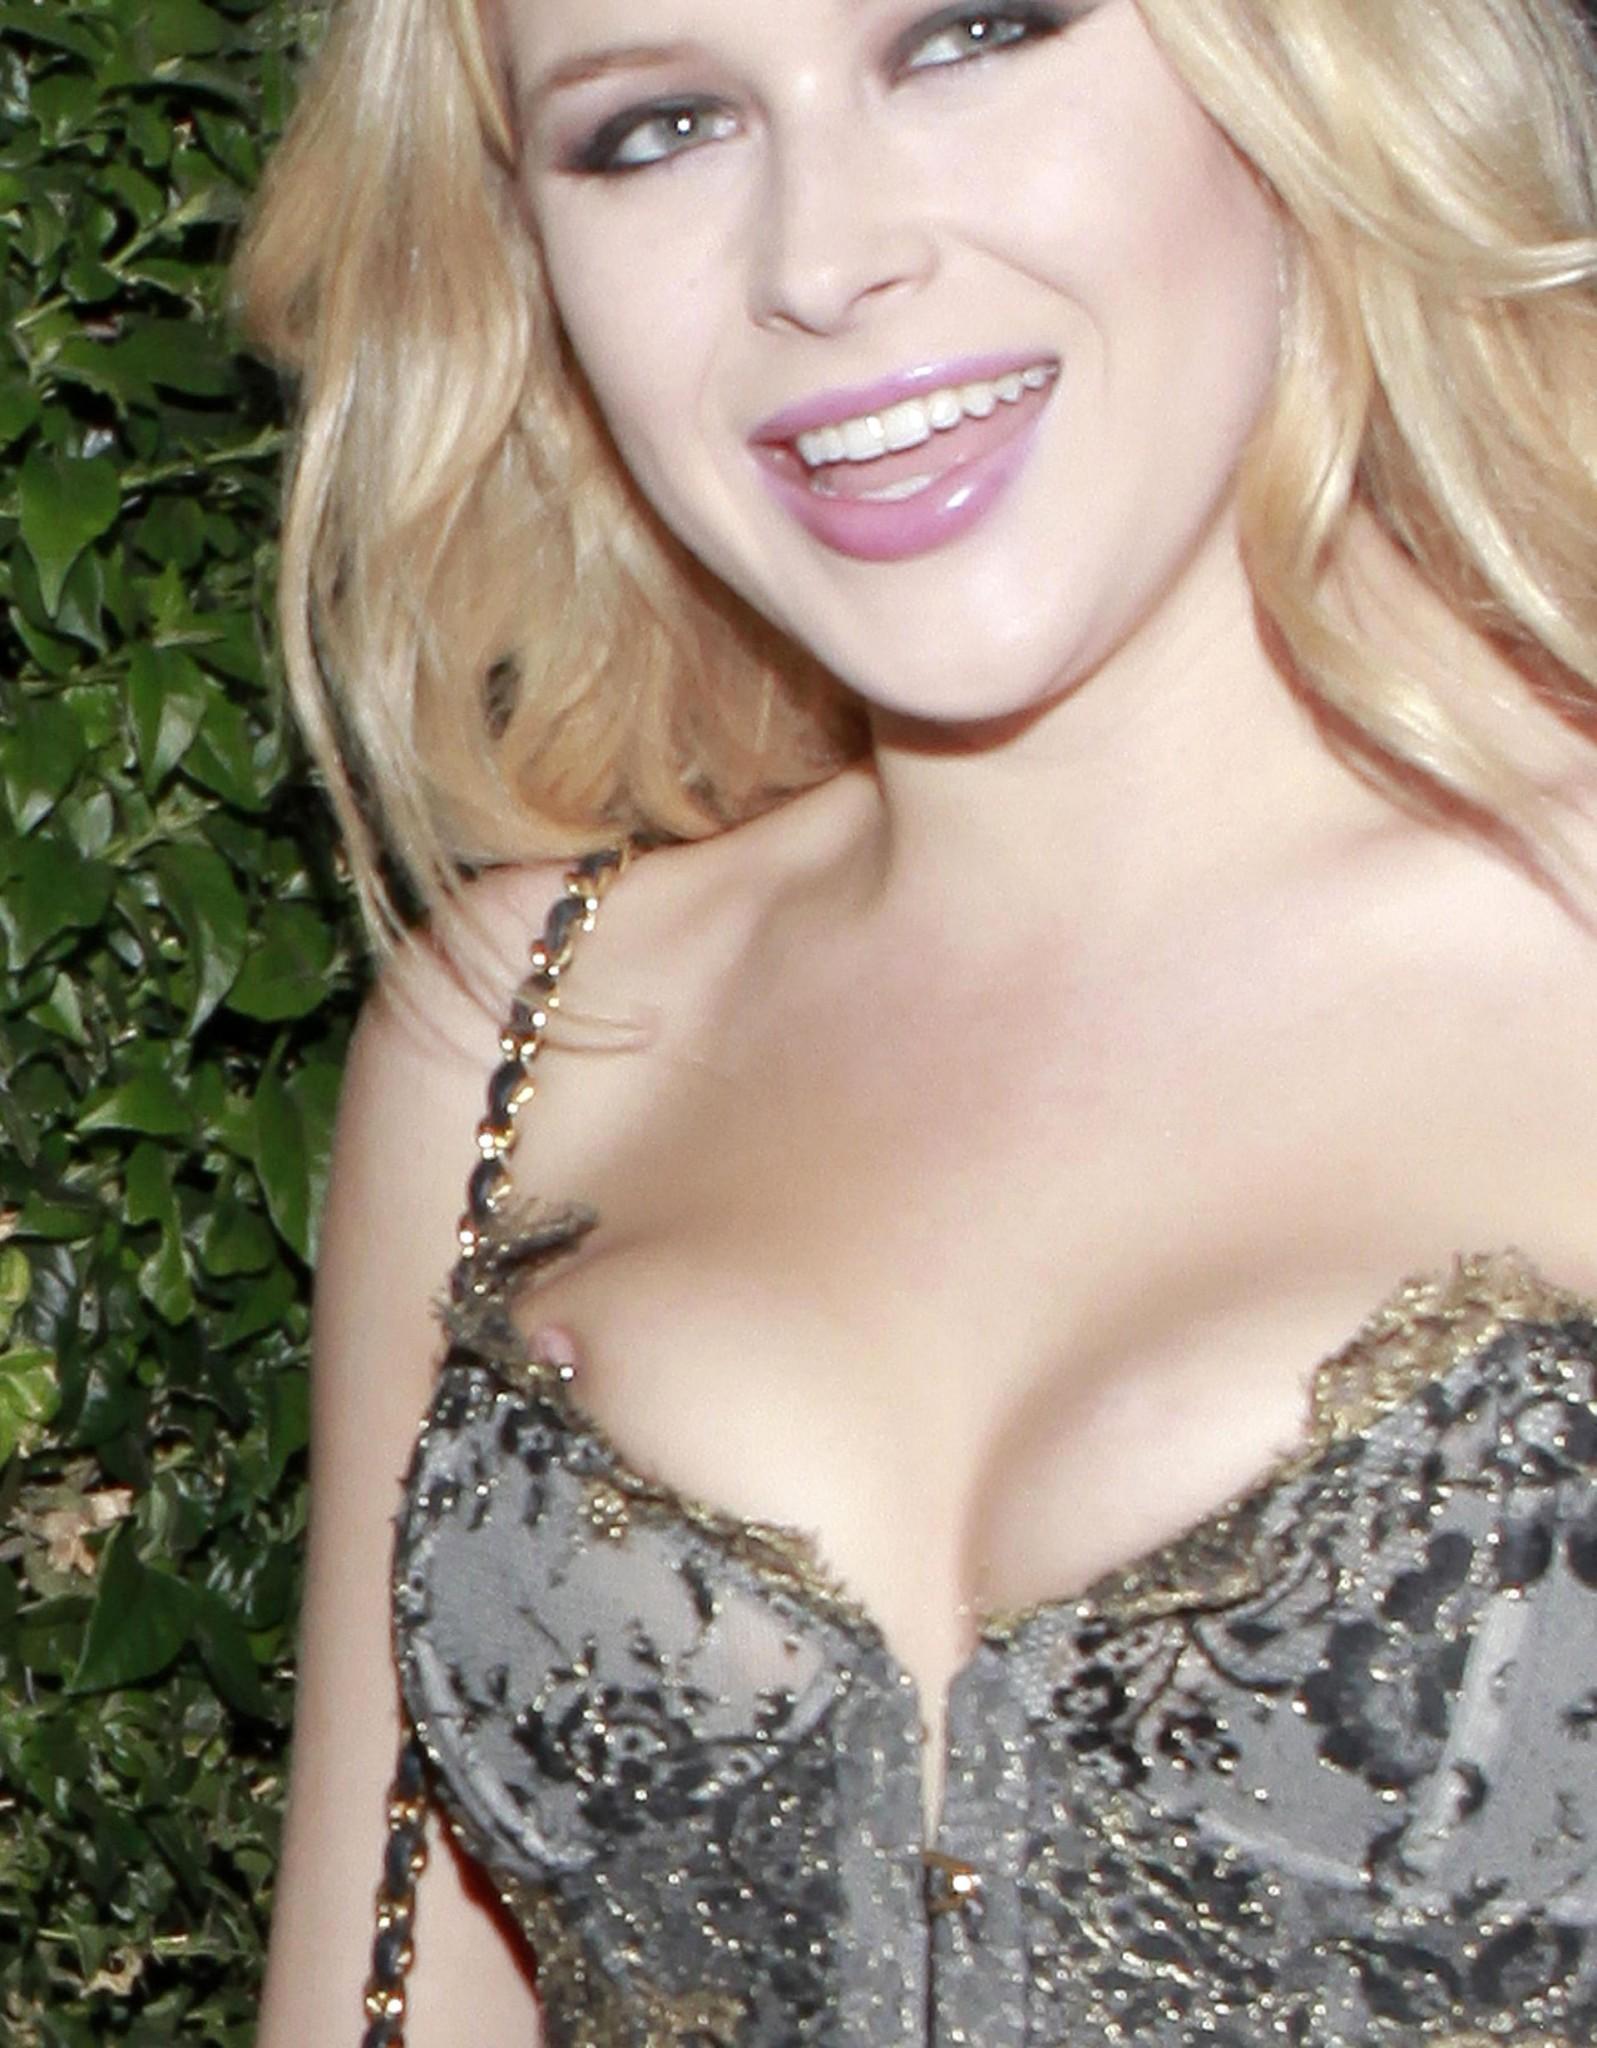 renee-olstead-pierced-nipple-slip-6.jpg